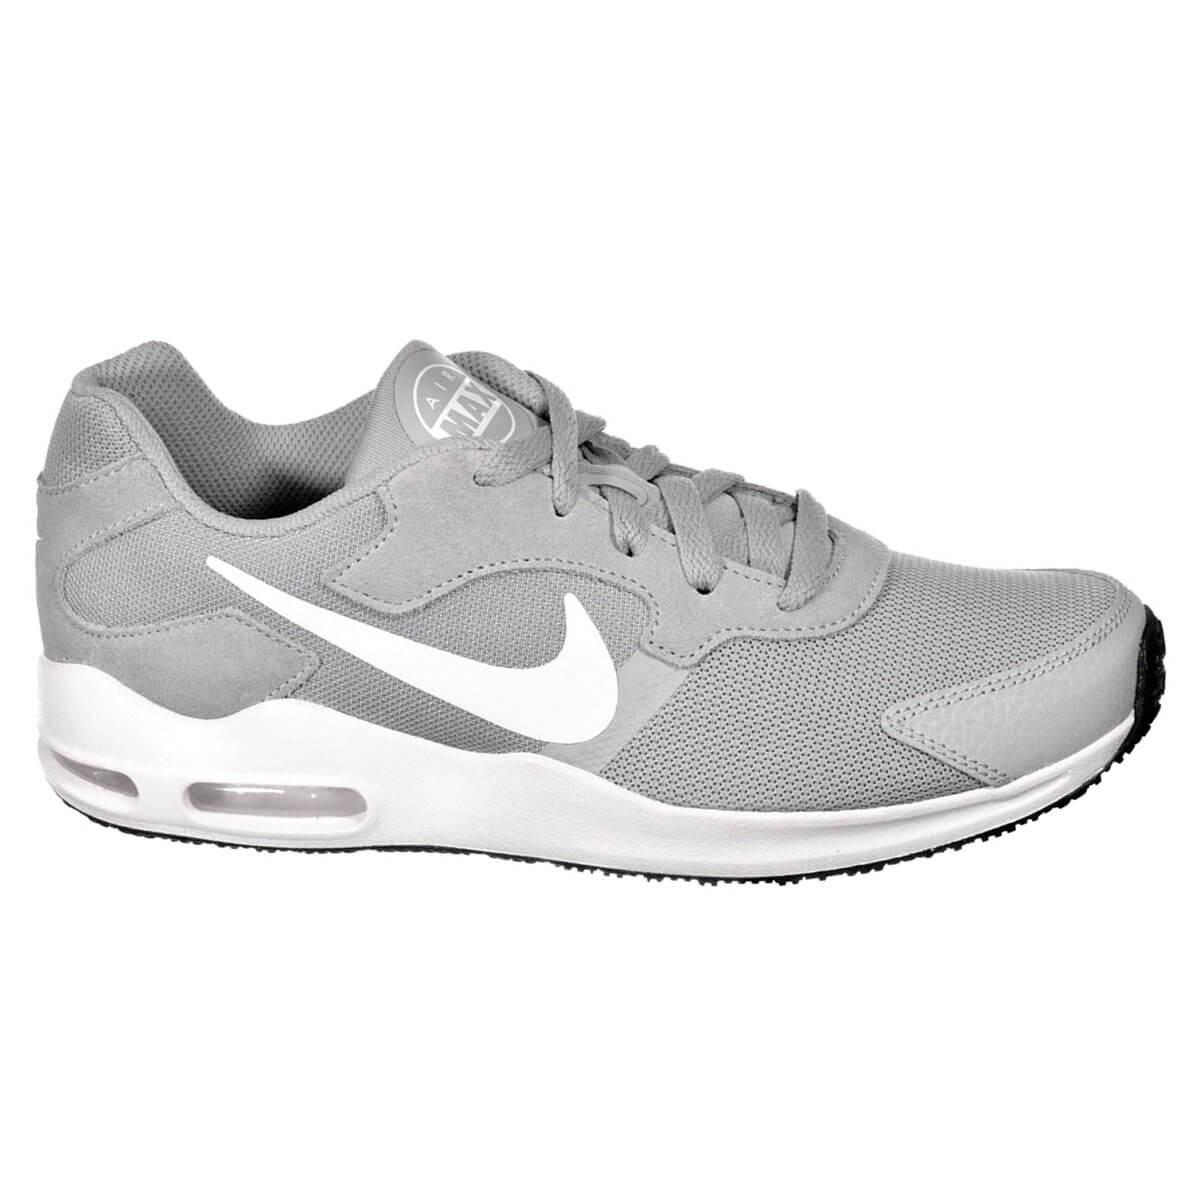 ec01884864f Tênis Masculino Nike Air Max Guile 916768-001 - Cinza Branco ...